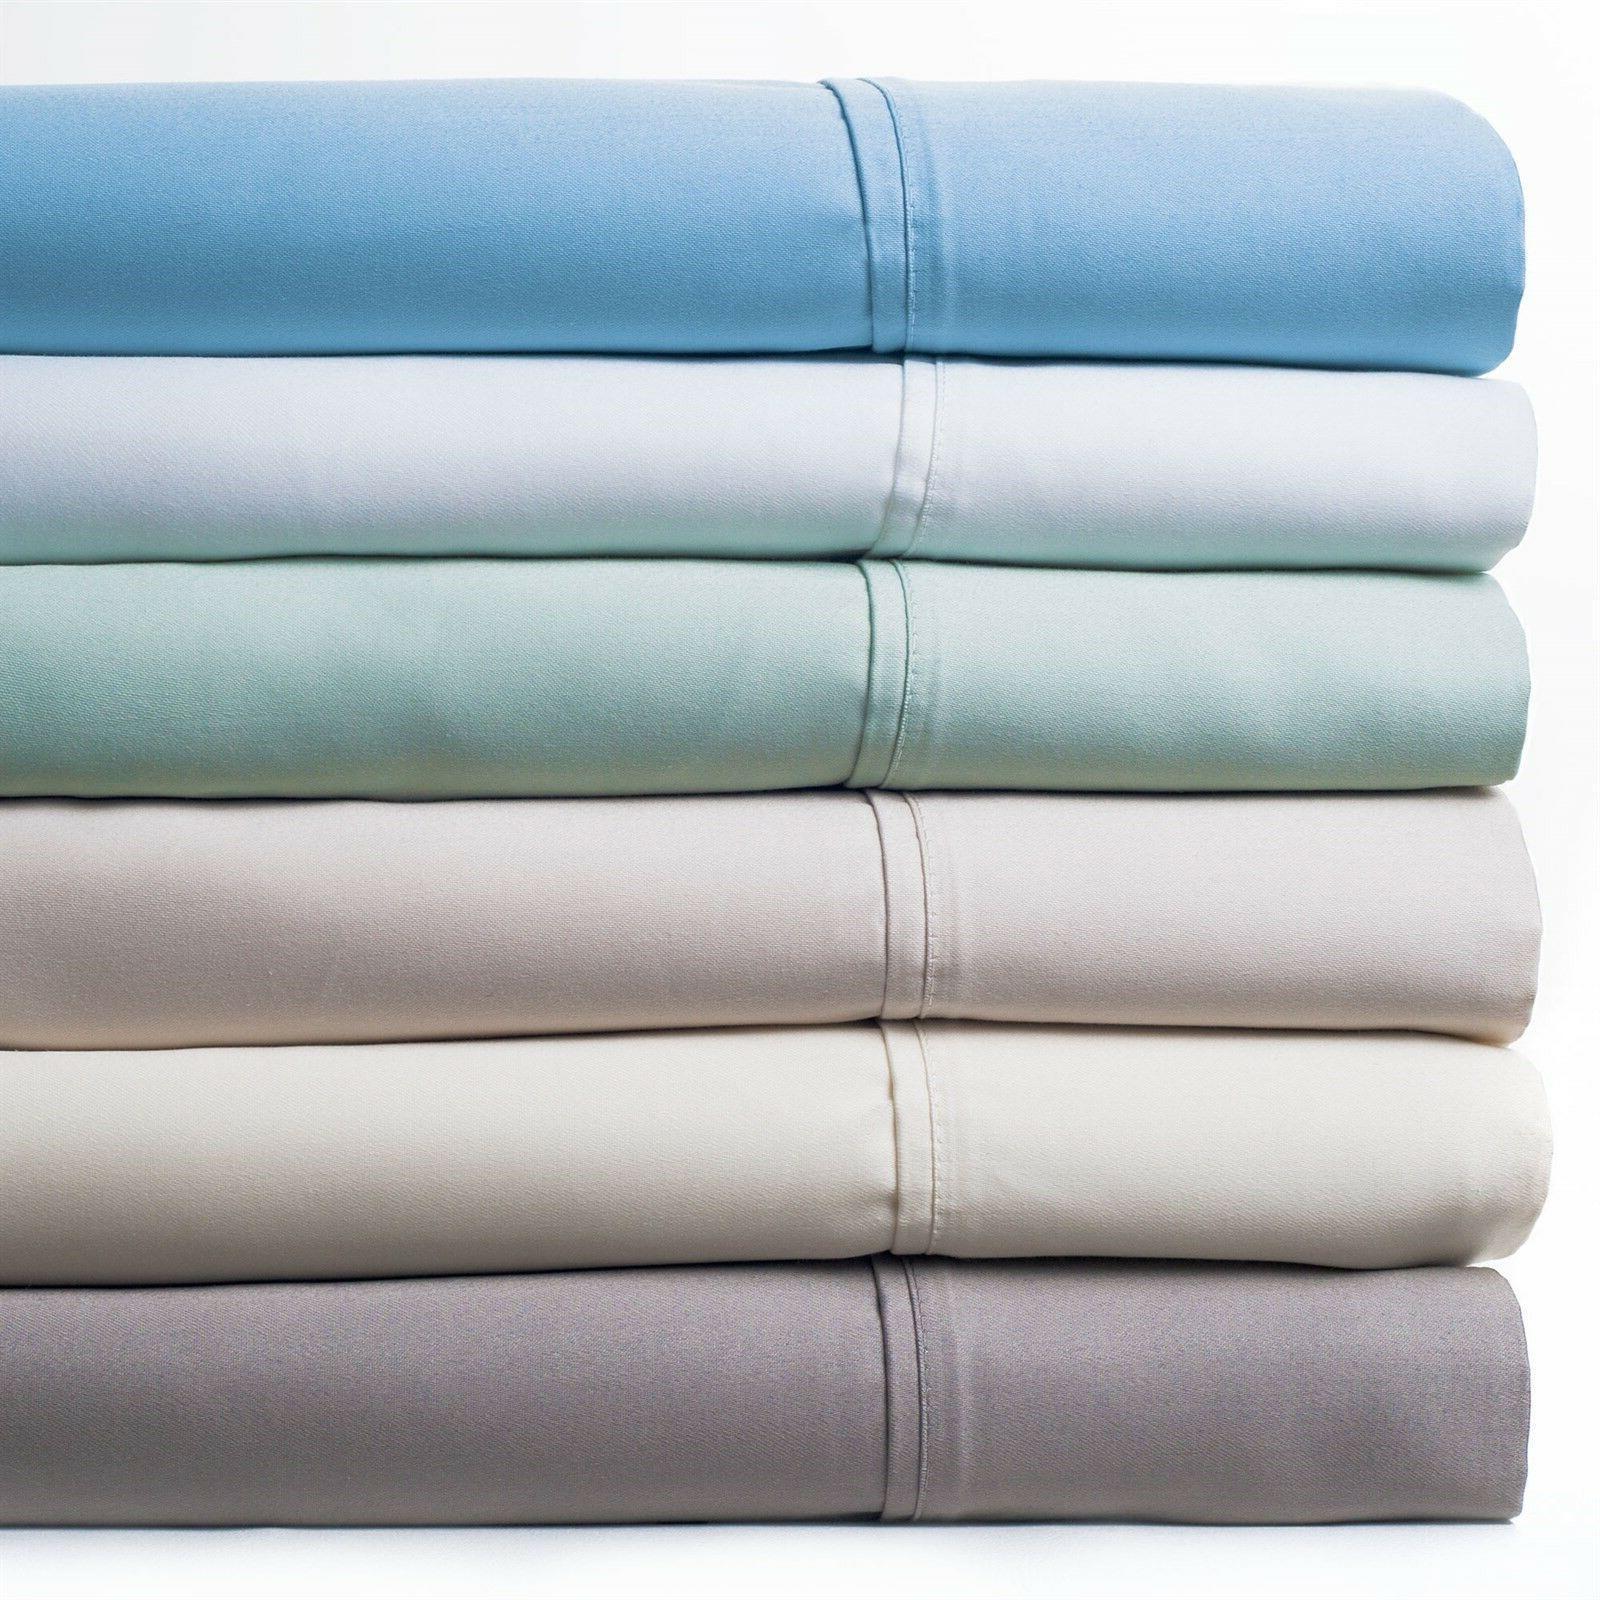 high quality 1000 thread count cotton rich